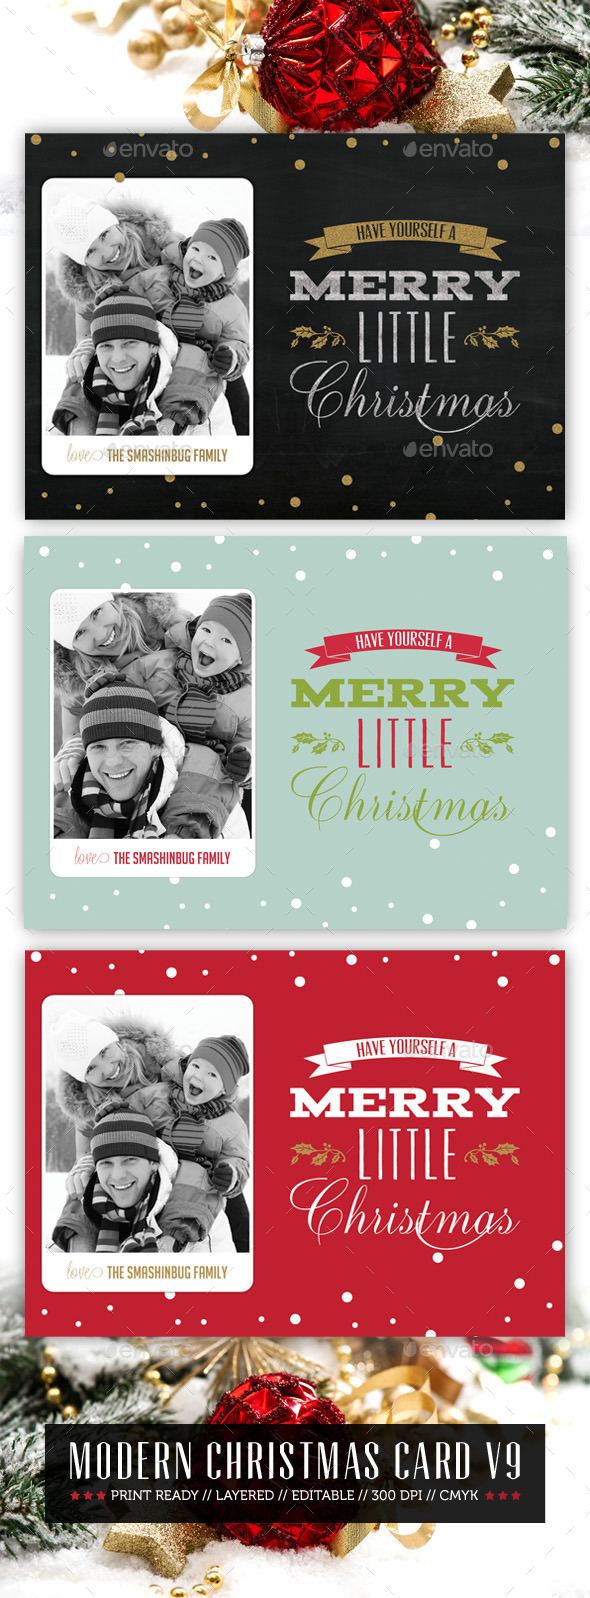 Modern Christmas Card V9 - Holiday Greeting Cards